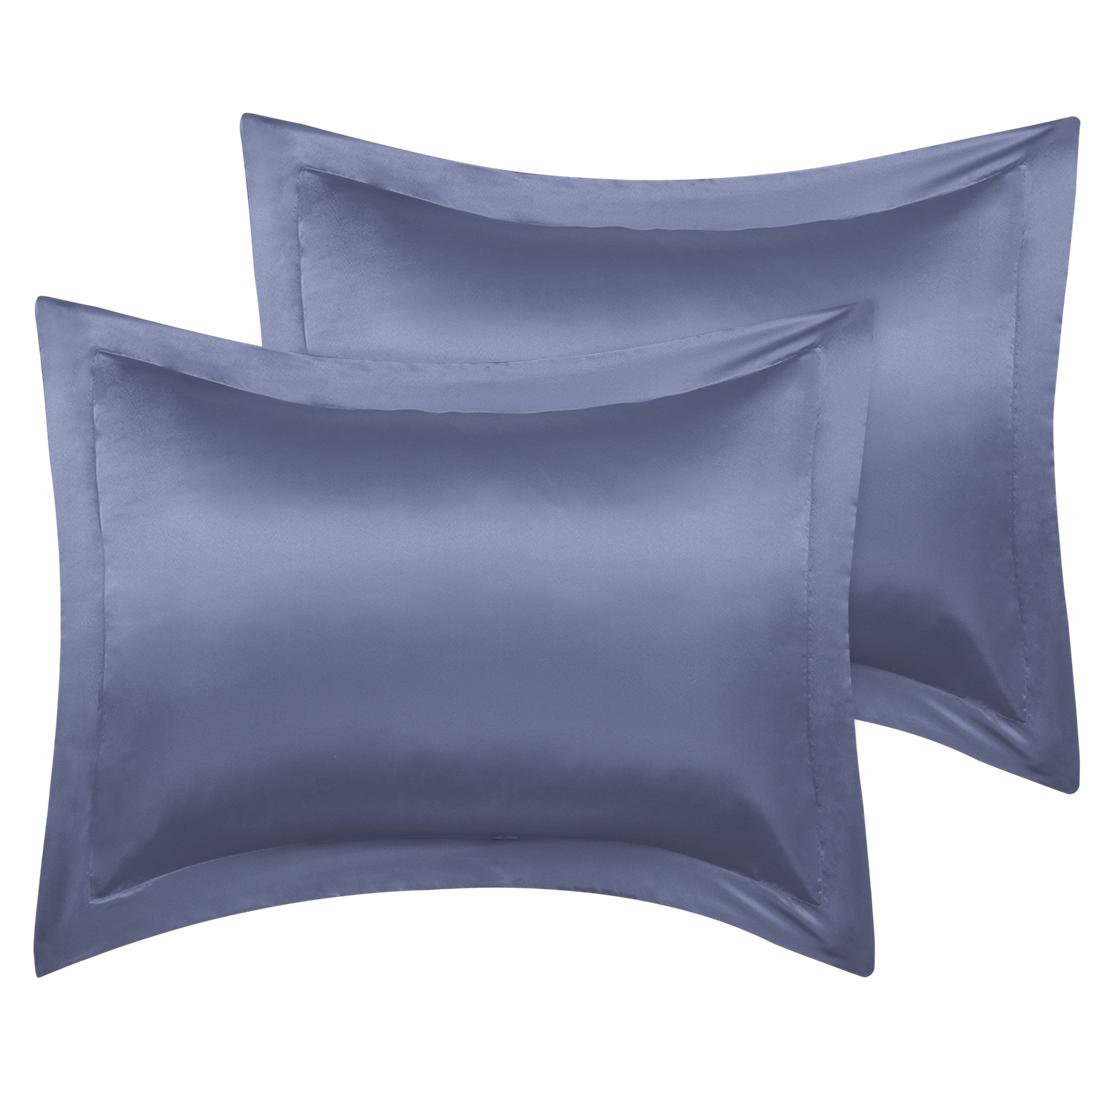 2 Pcs Slate Gray Pillow Shams Satin Pillow Cases King Oxford Pillowcases